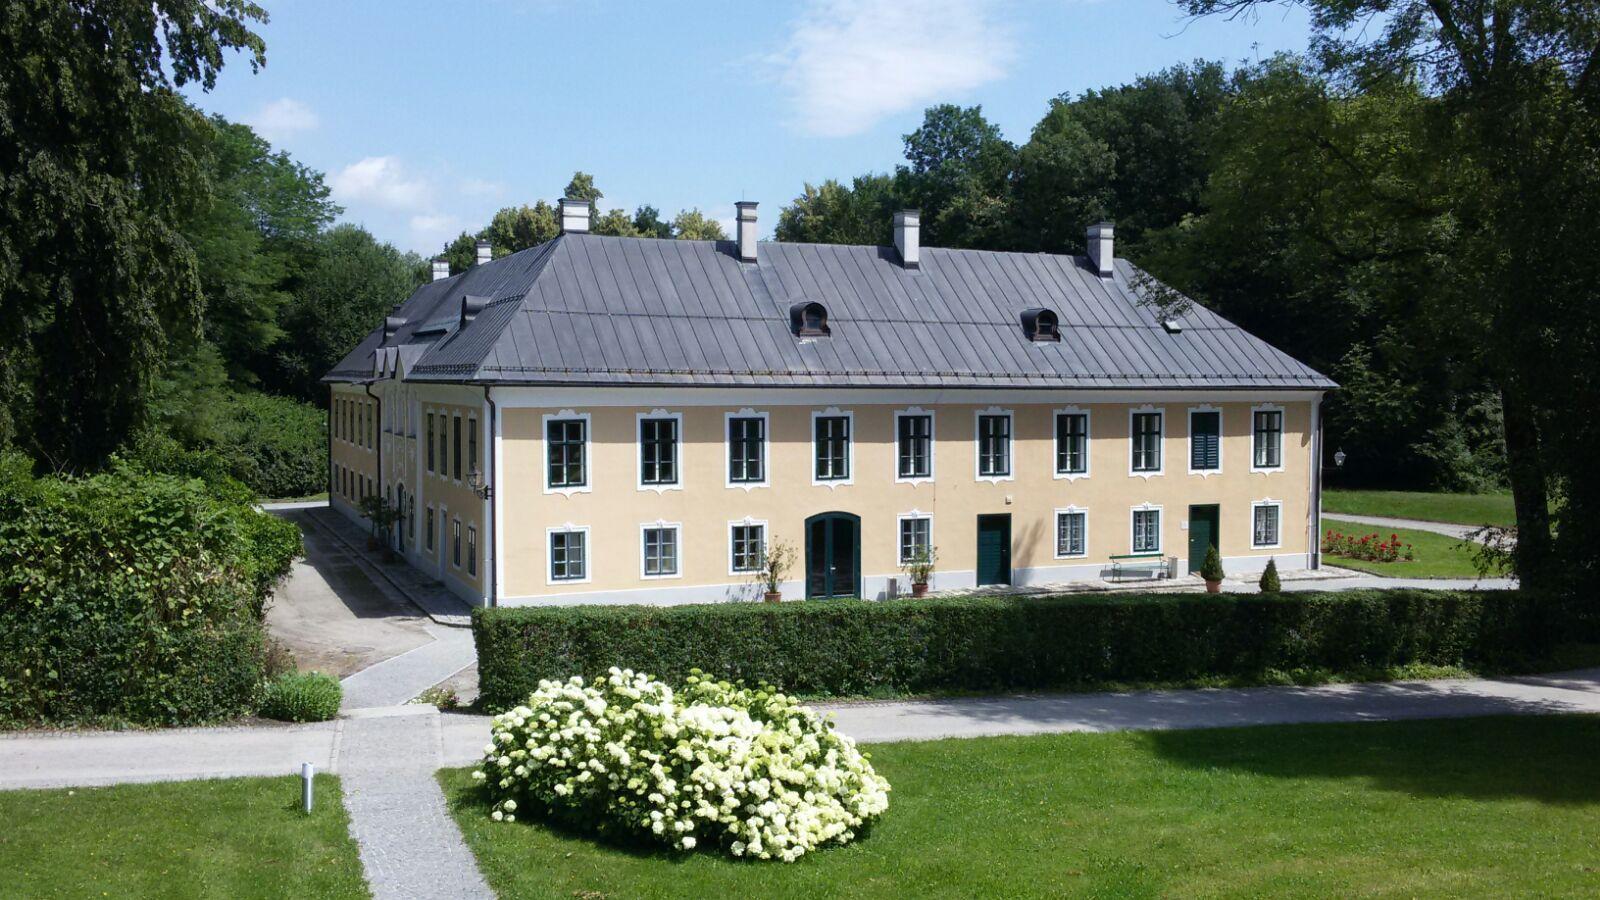 Hartlauer Akademie in Kronstdorf